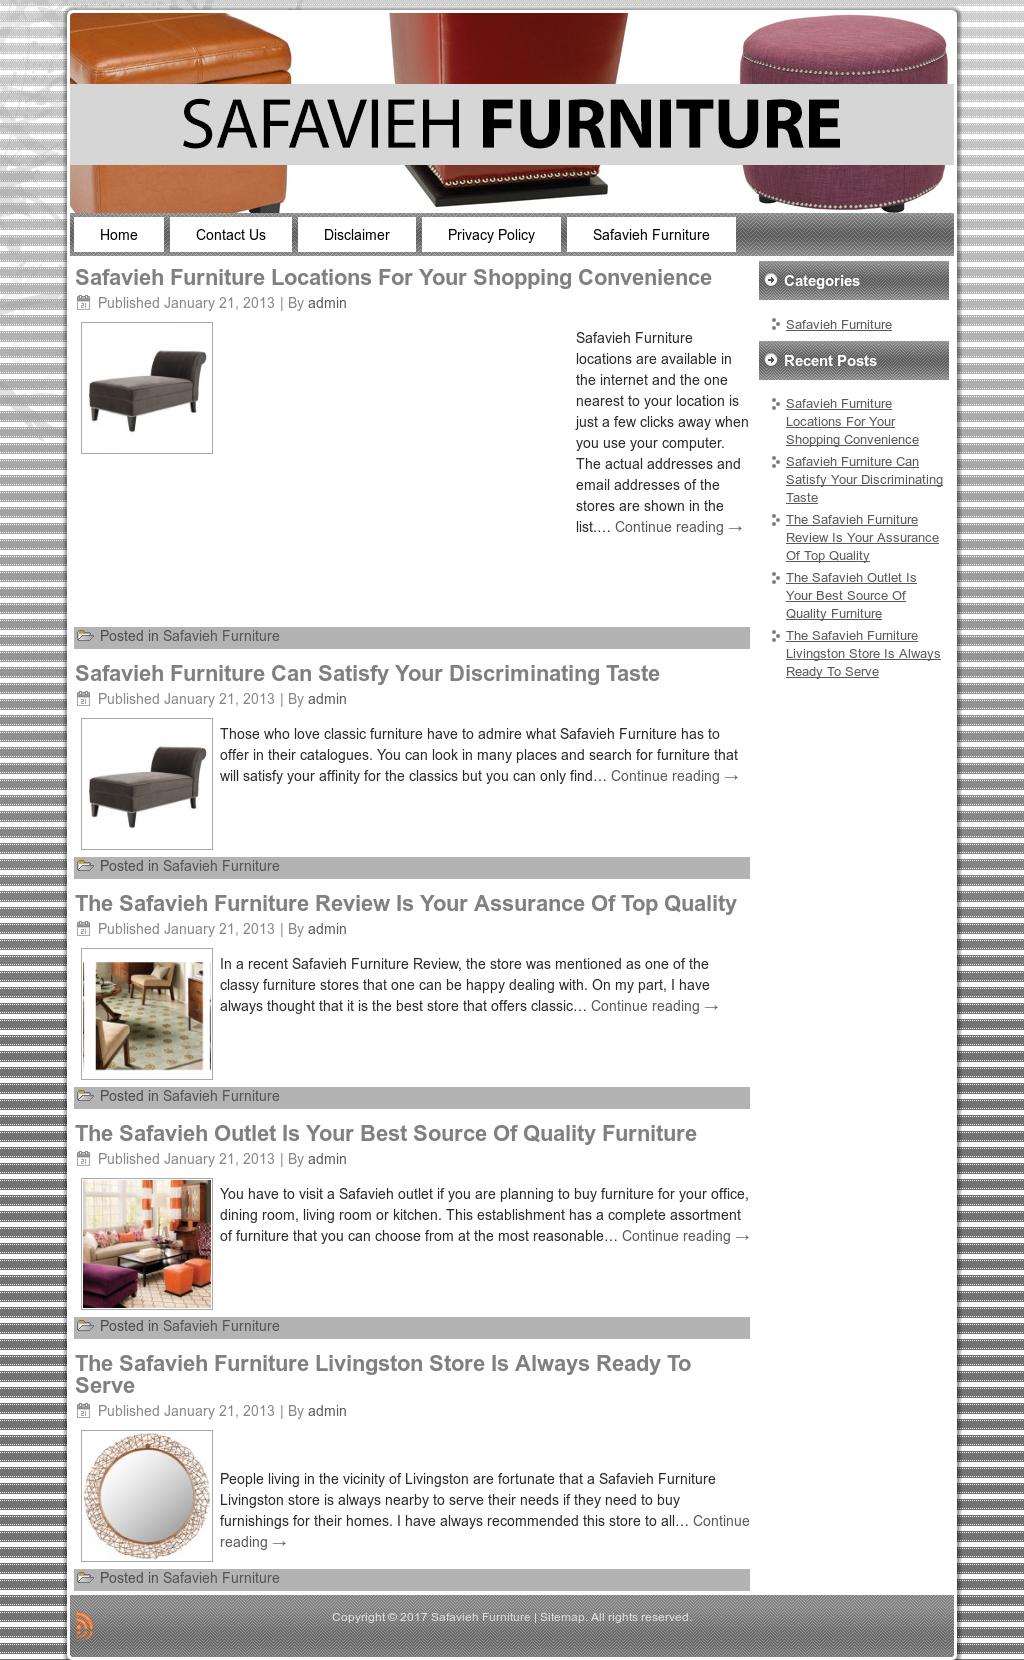 Safavieh Furniture Website History